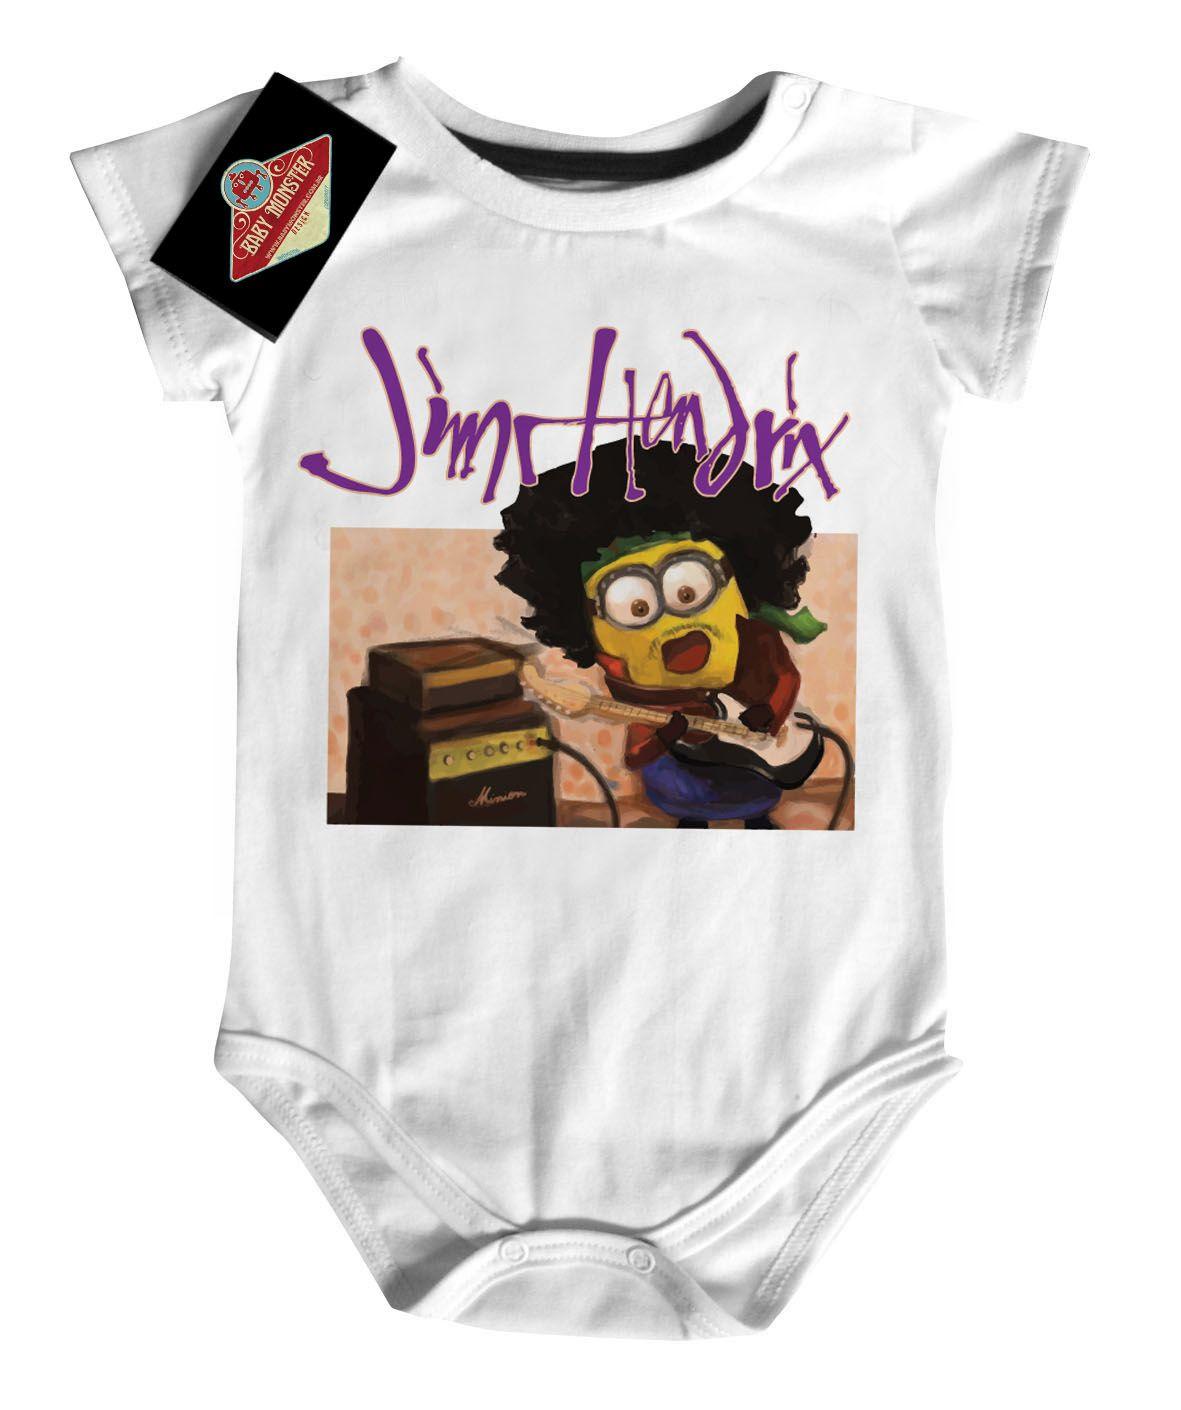 Body Rock Bebê Jimi Hendrix - Minions - White  - Baby Monster - Body Bebe